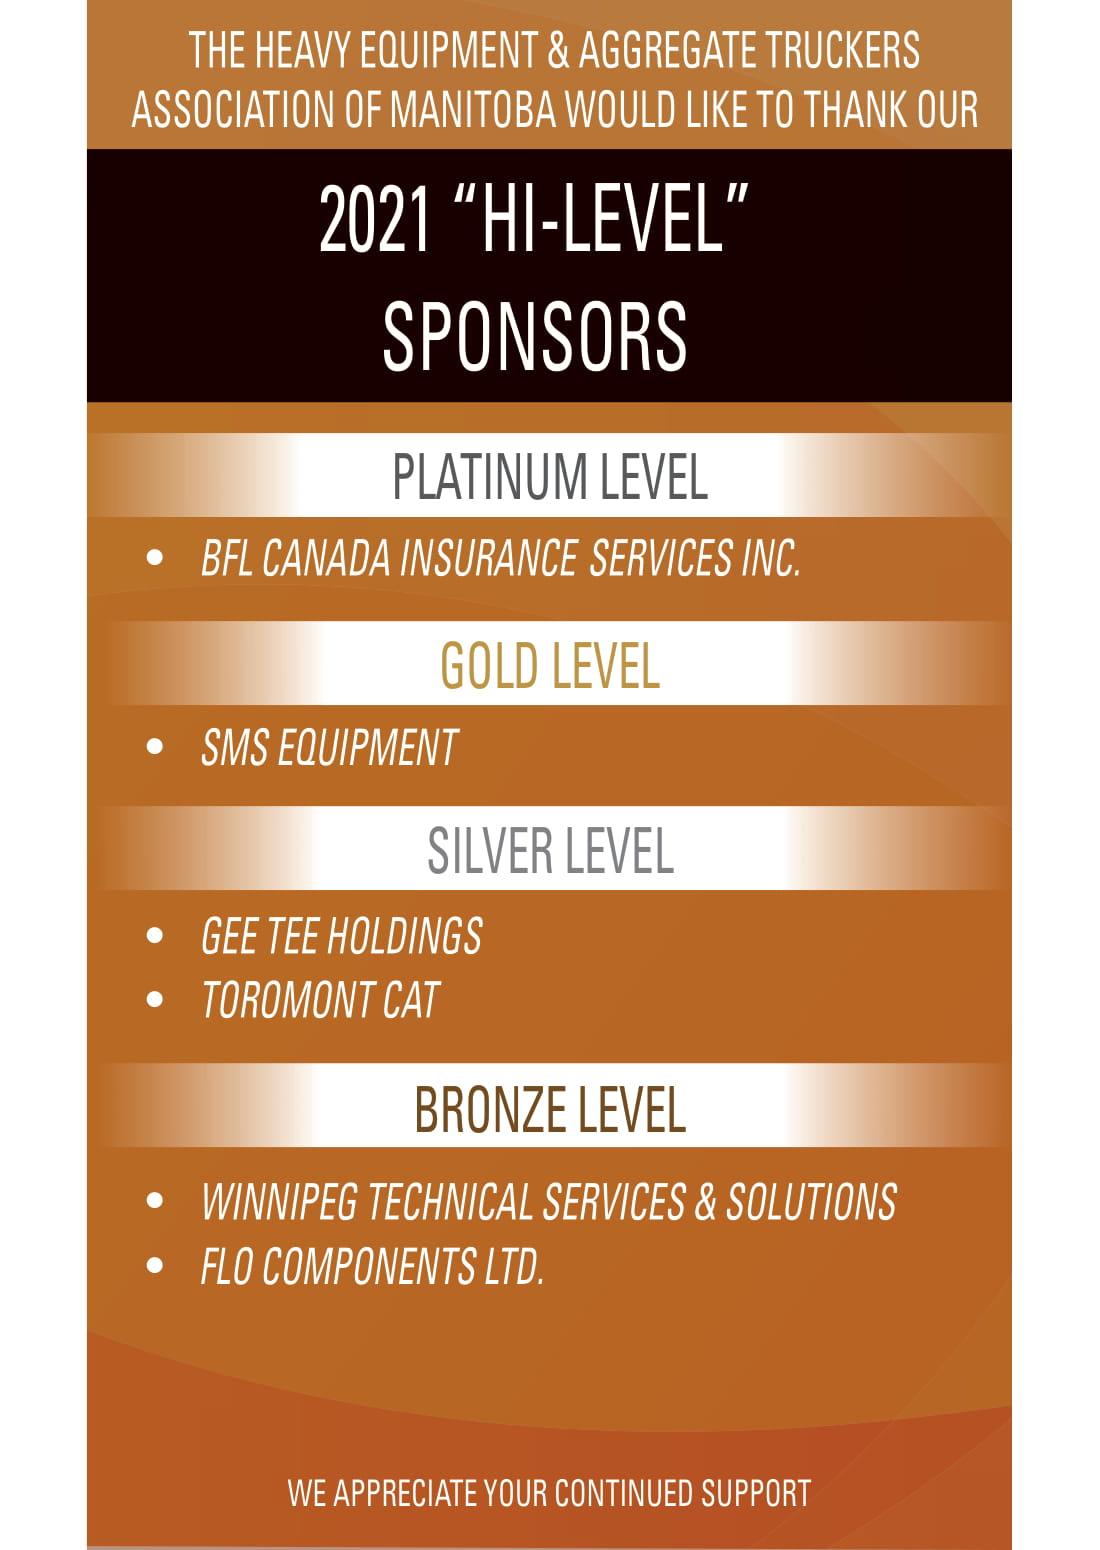 Heatmb 2021 Hi-Level Sponsors